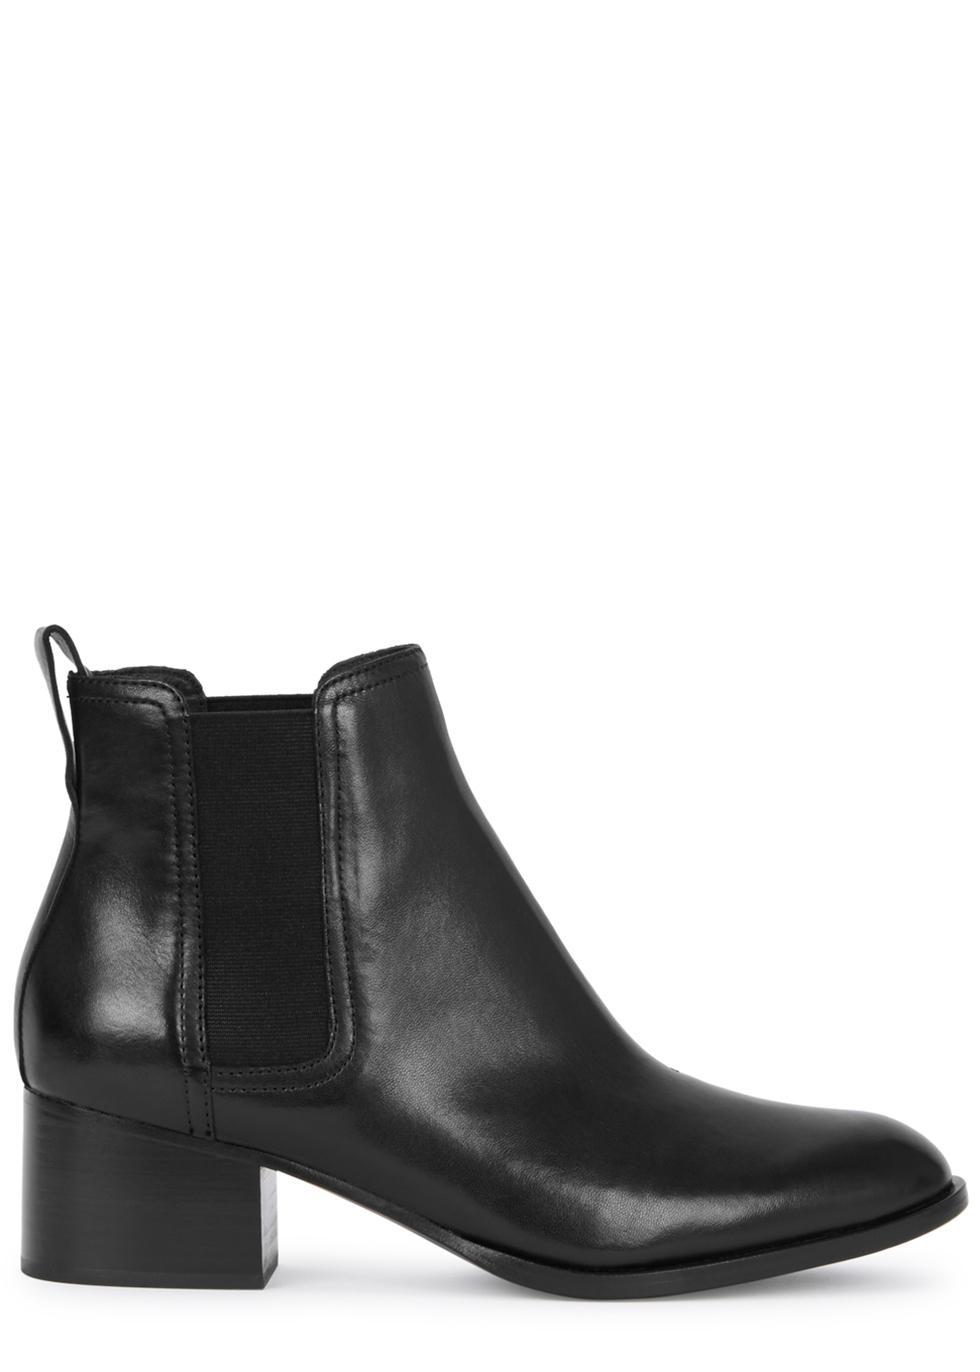 Walker 50 black leather ankle boots - rag & bone